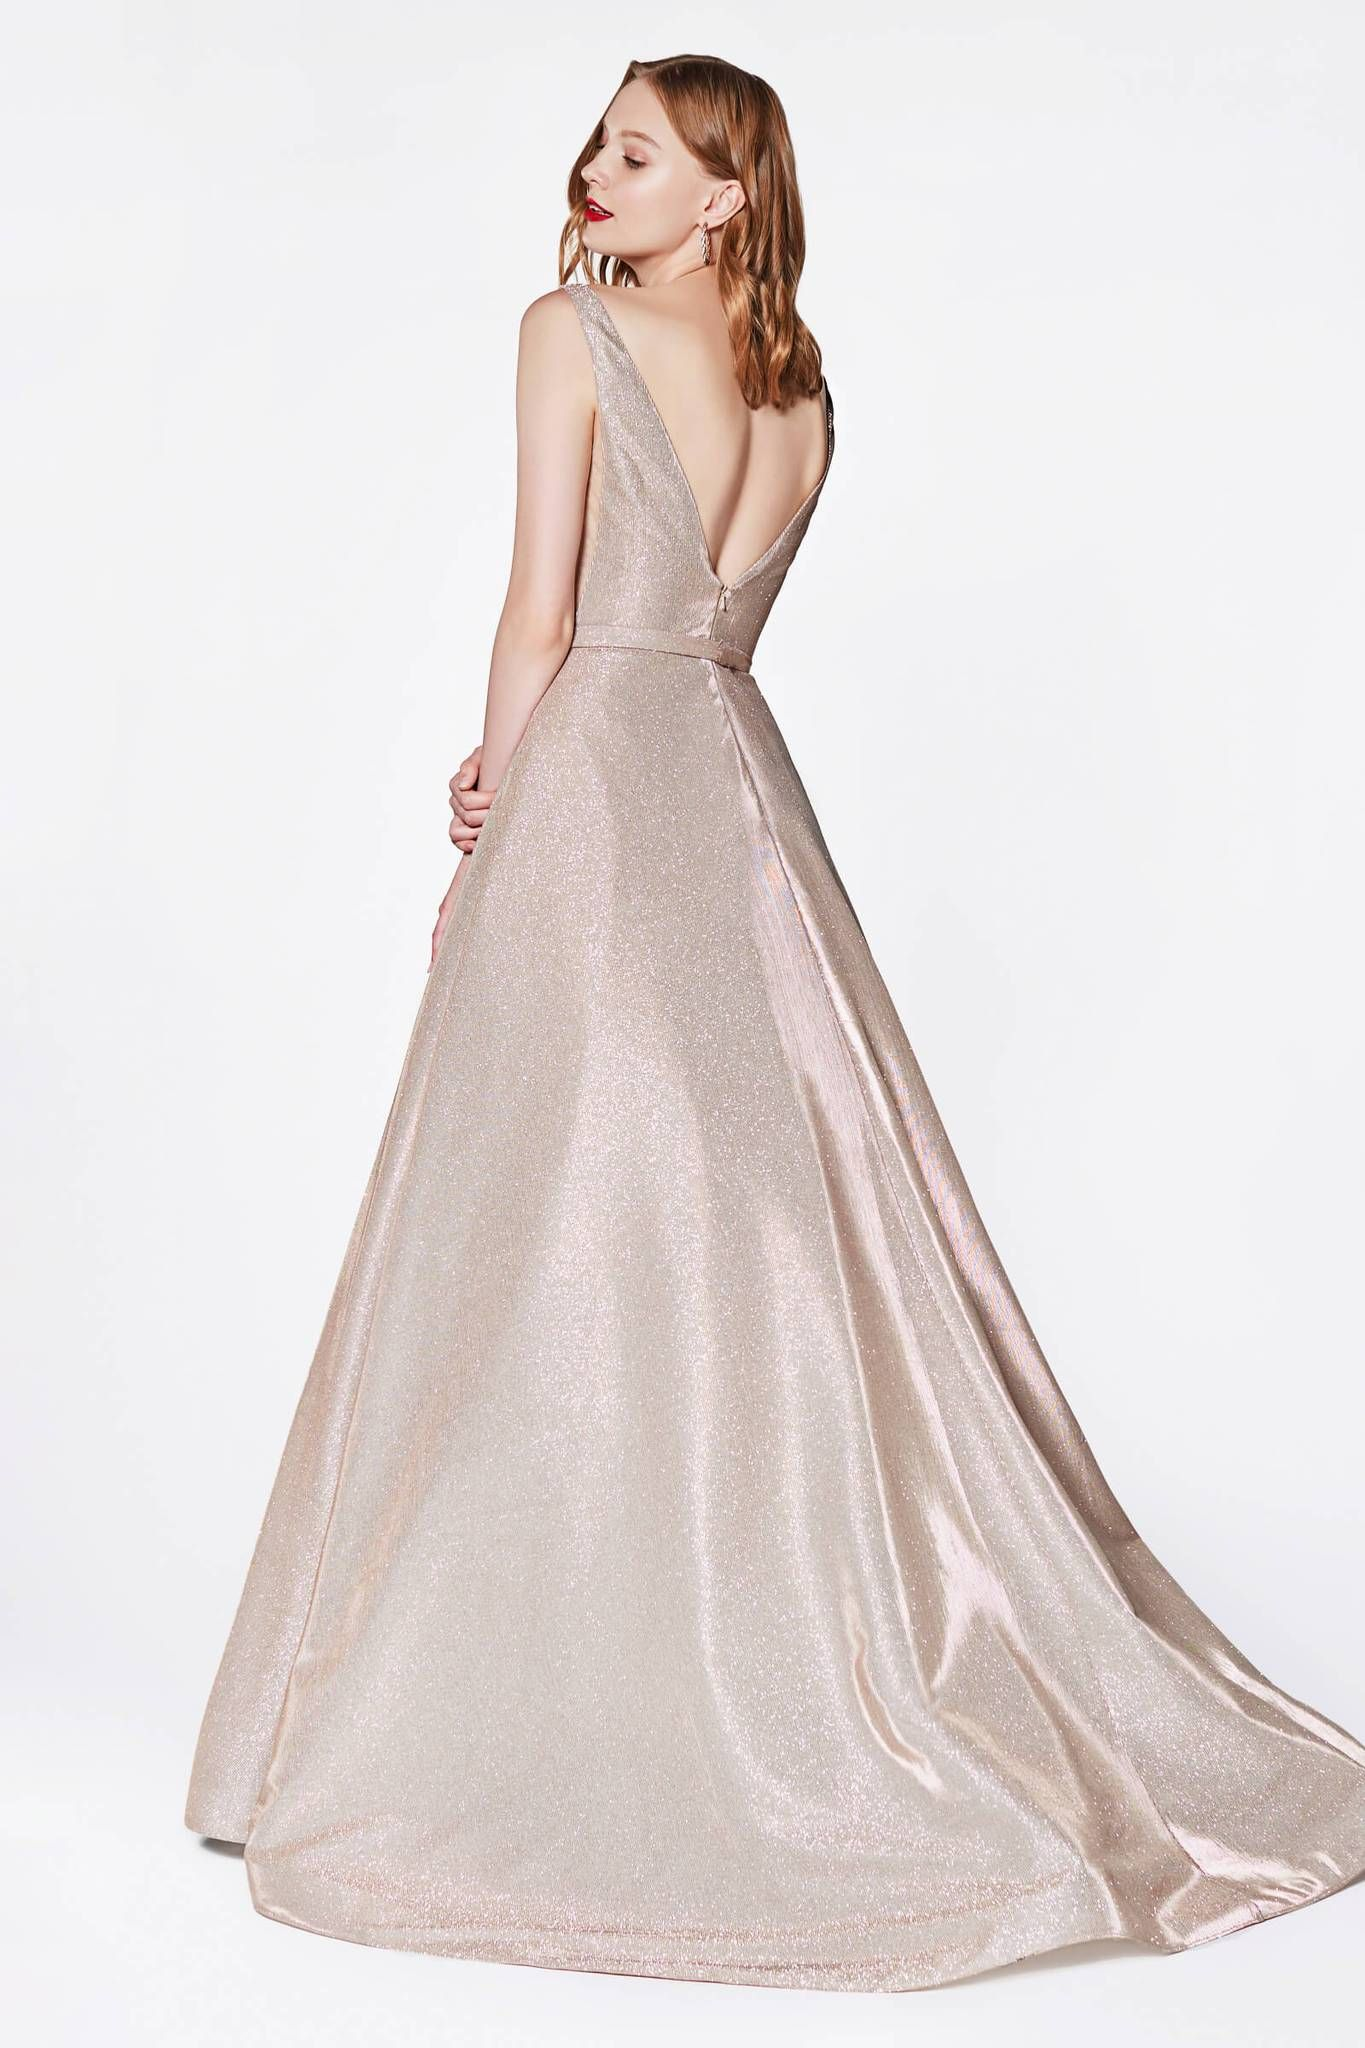 161042fca Long Metallic Plus Size Prom Dress - The Dress Outlet   Plus Size ...